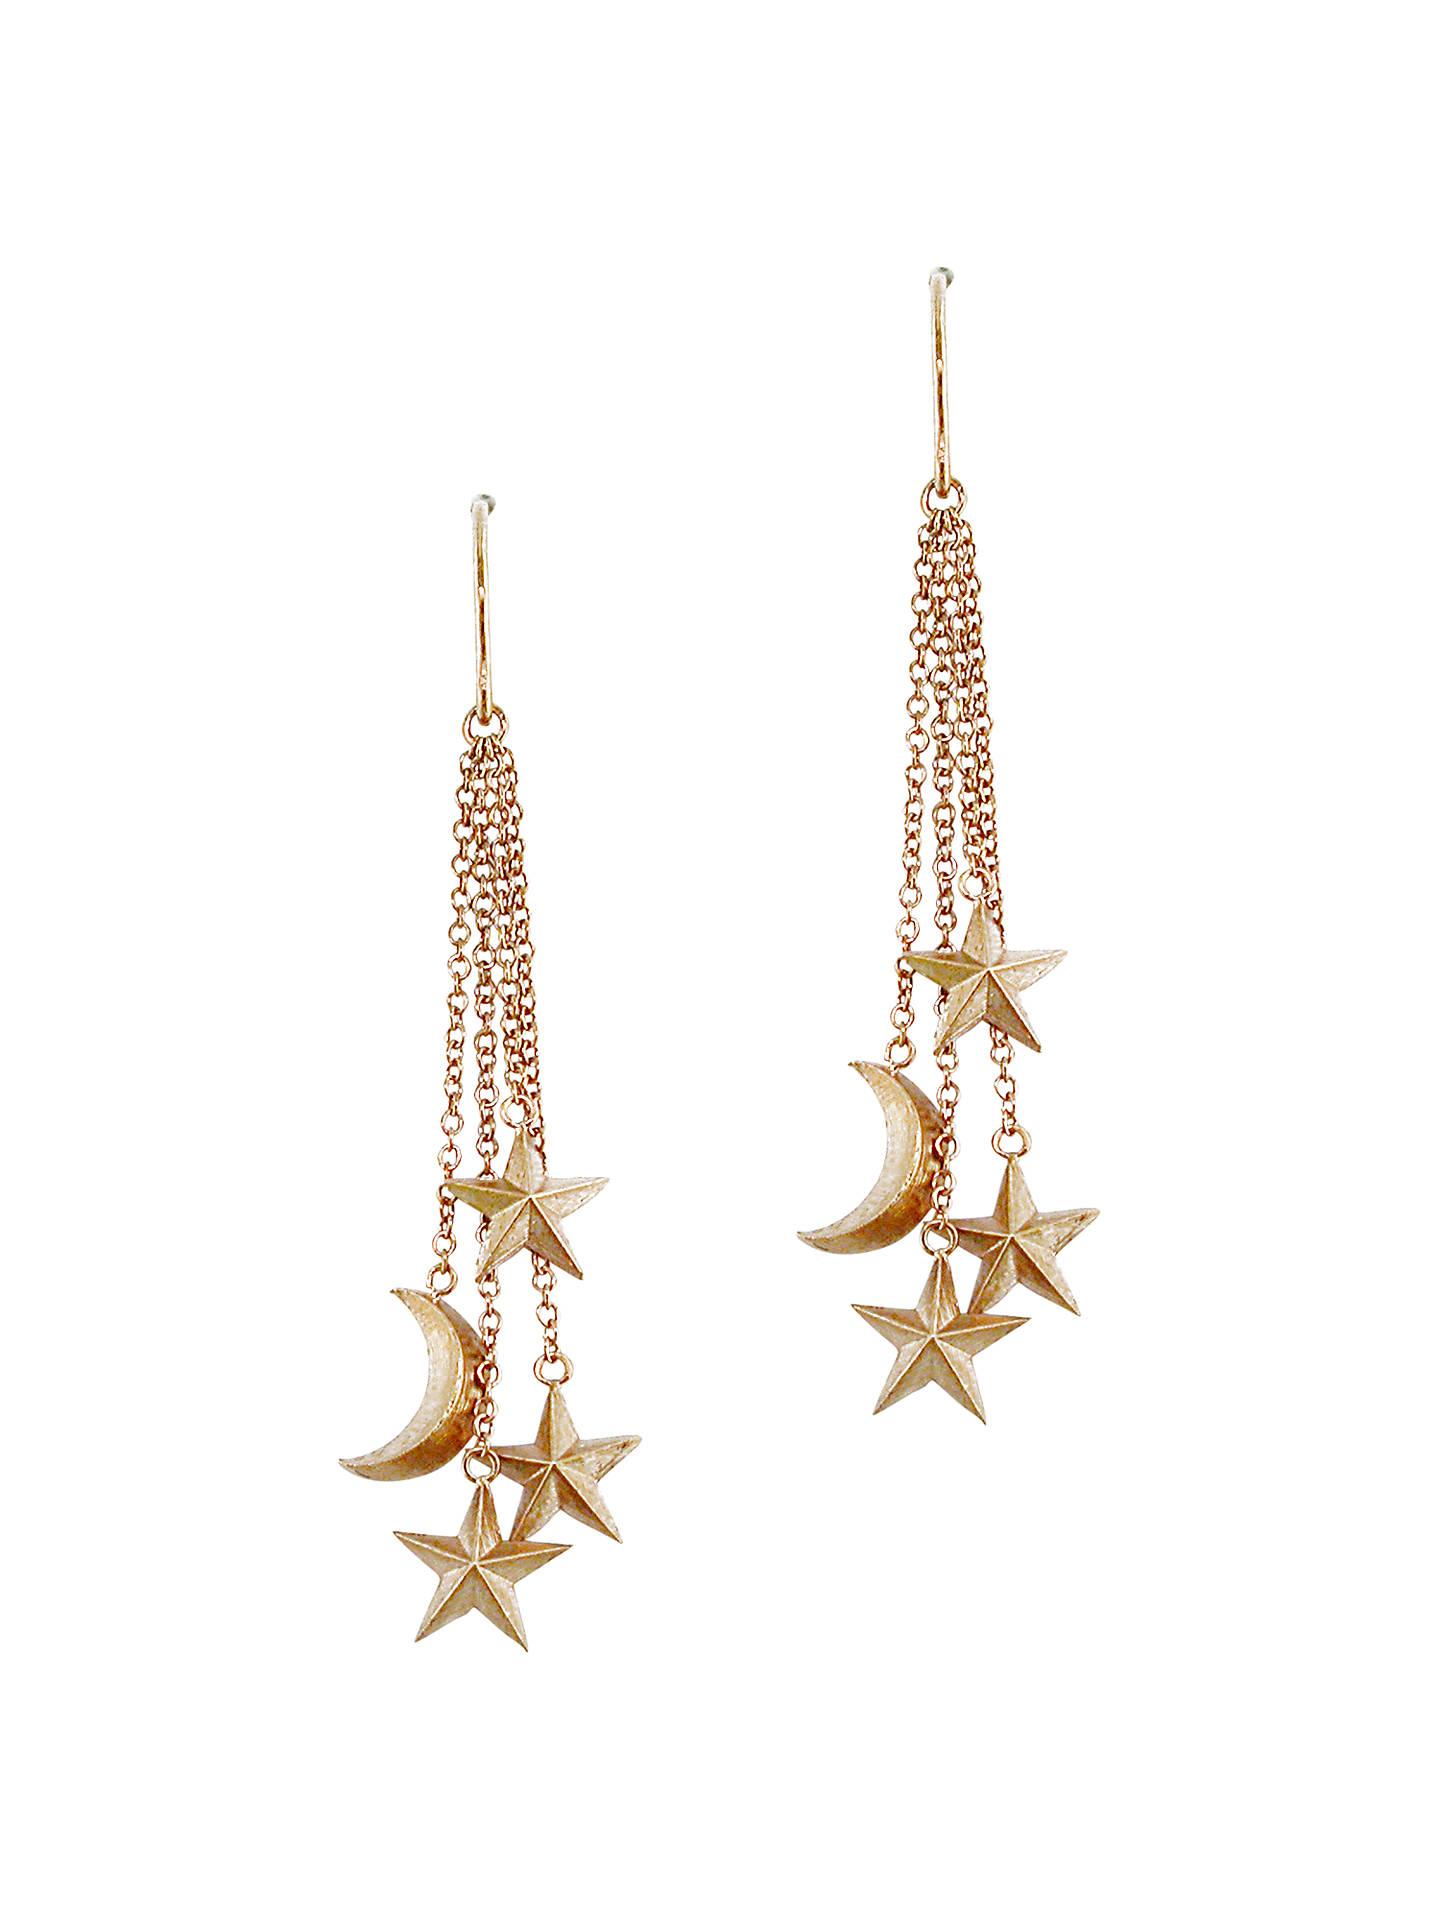 BuyLondon Road 9ct Rose Gold Moon and Stars Drop Earrings 5d1d4477d